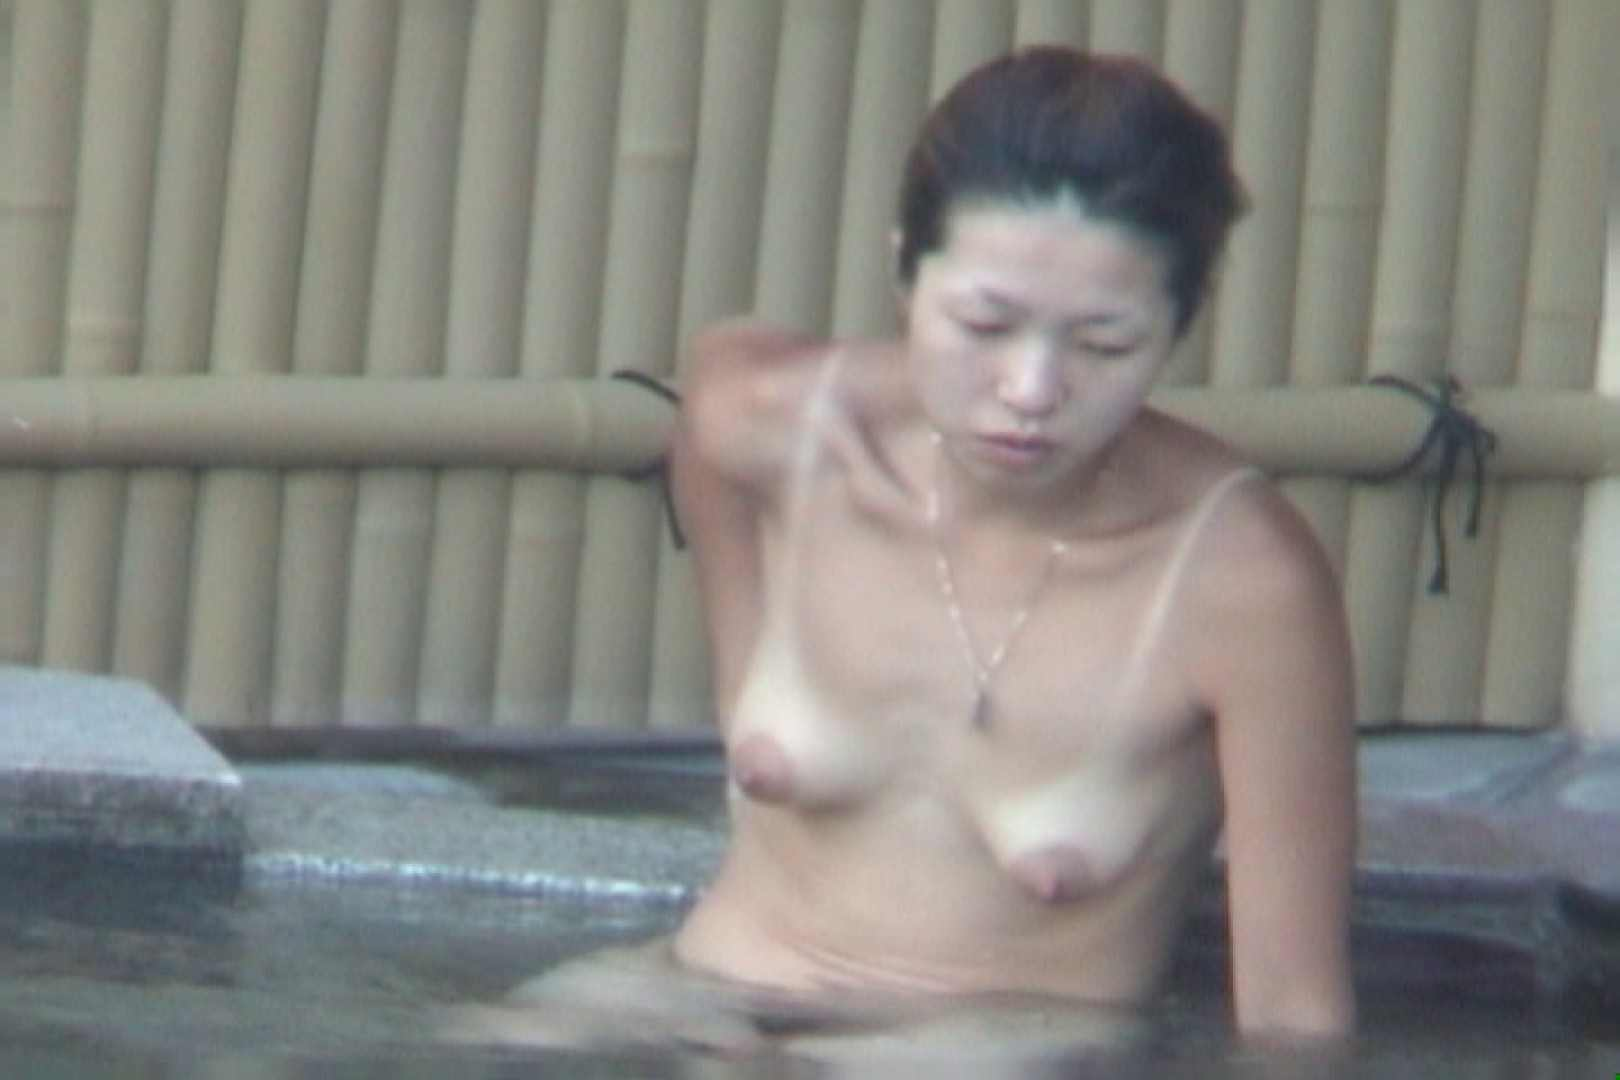 Aquaな露天風呂Vol.571 盗撮映像  35Pix 3